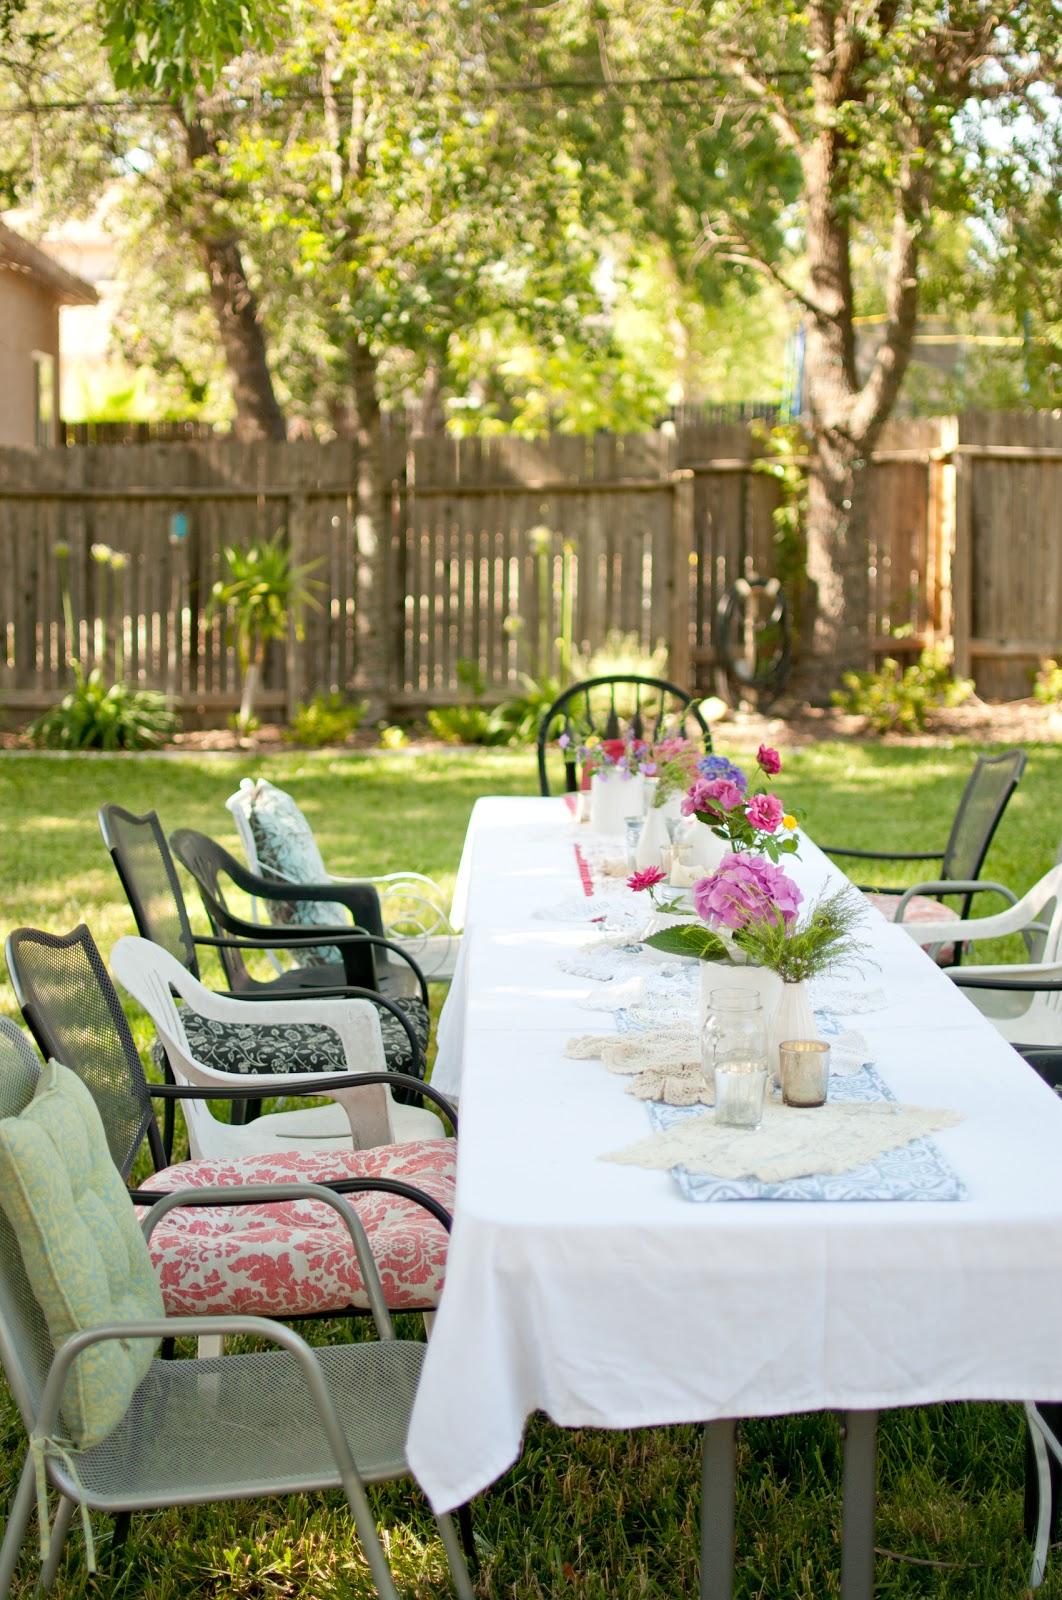 Domestic Fashionista: Summer Backyard Birthday Party